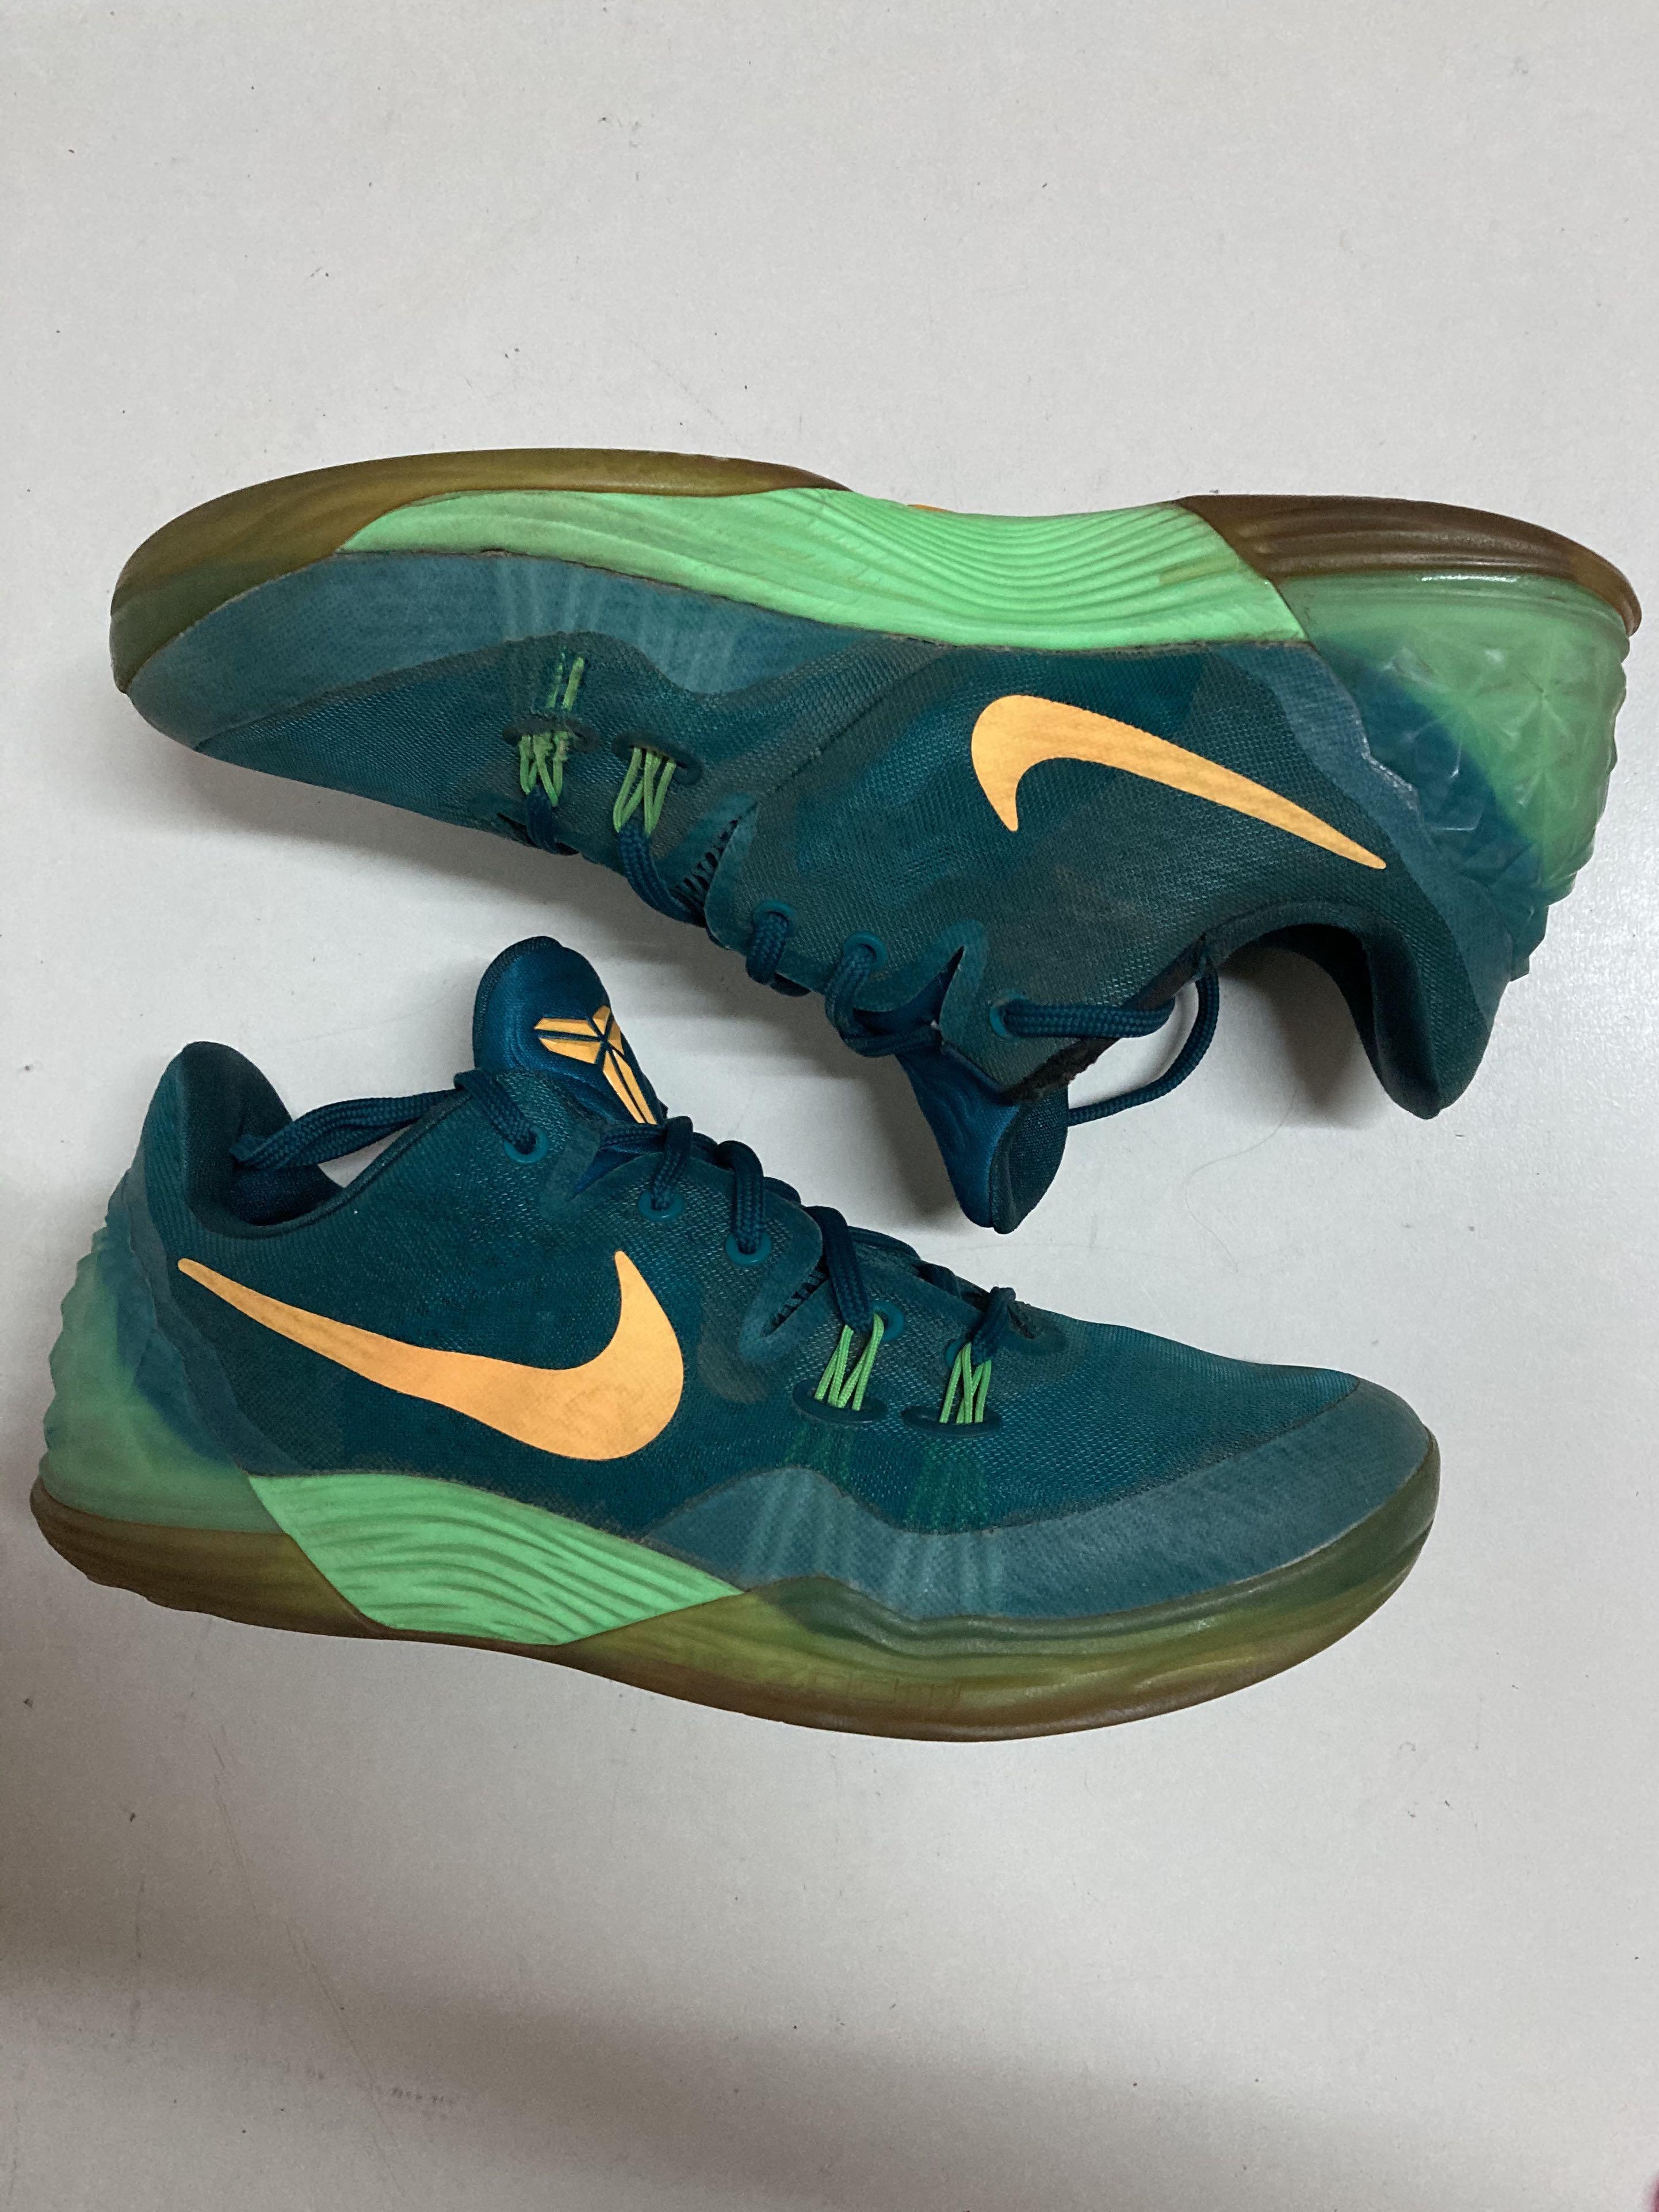 Nike Kobe Venomenon 5 emerald 毒液5 曼巴 翡翠城 祖母綠 哈密瓜